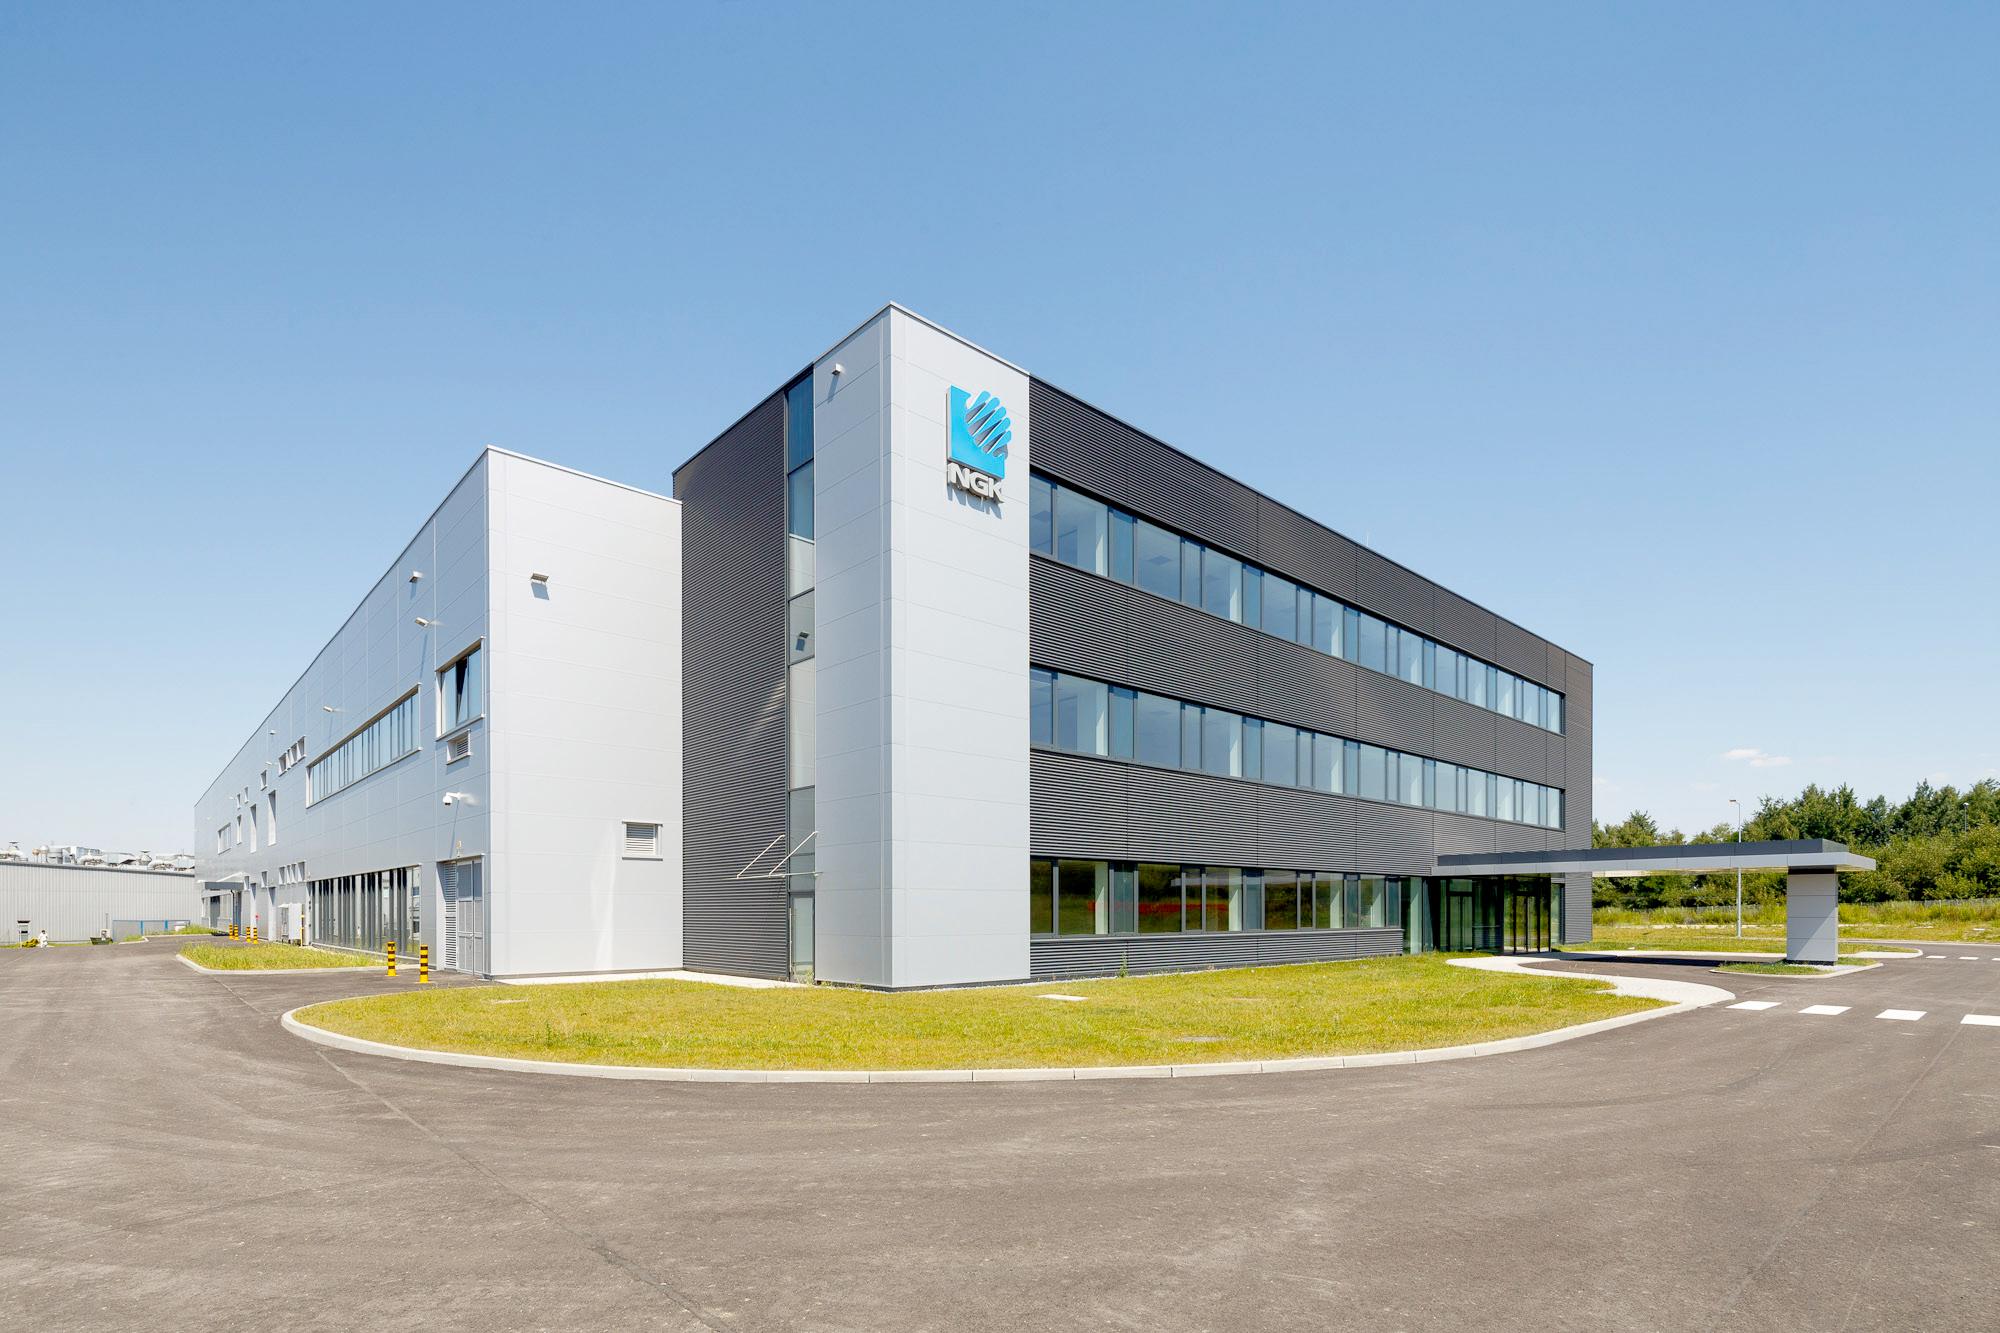 NGK Ceramics NOx Factory in Gilwice Poland built by Takenaka Europe